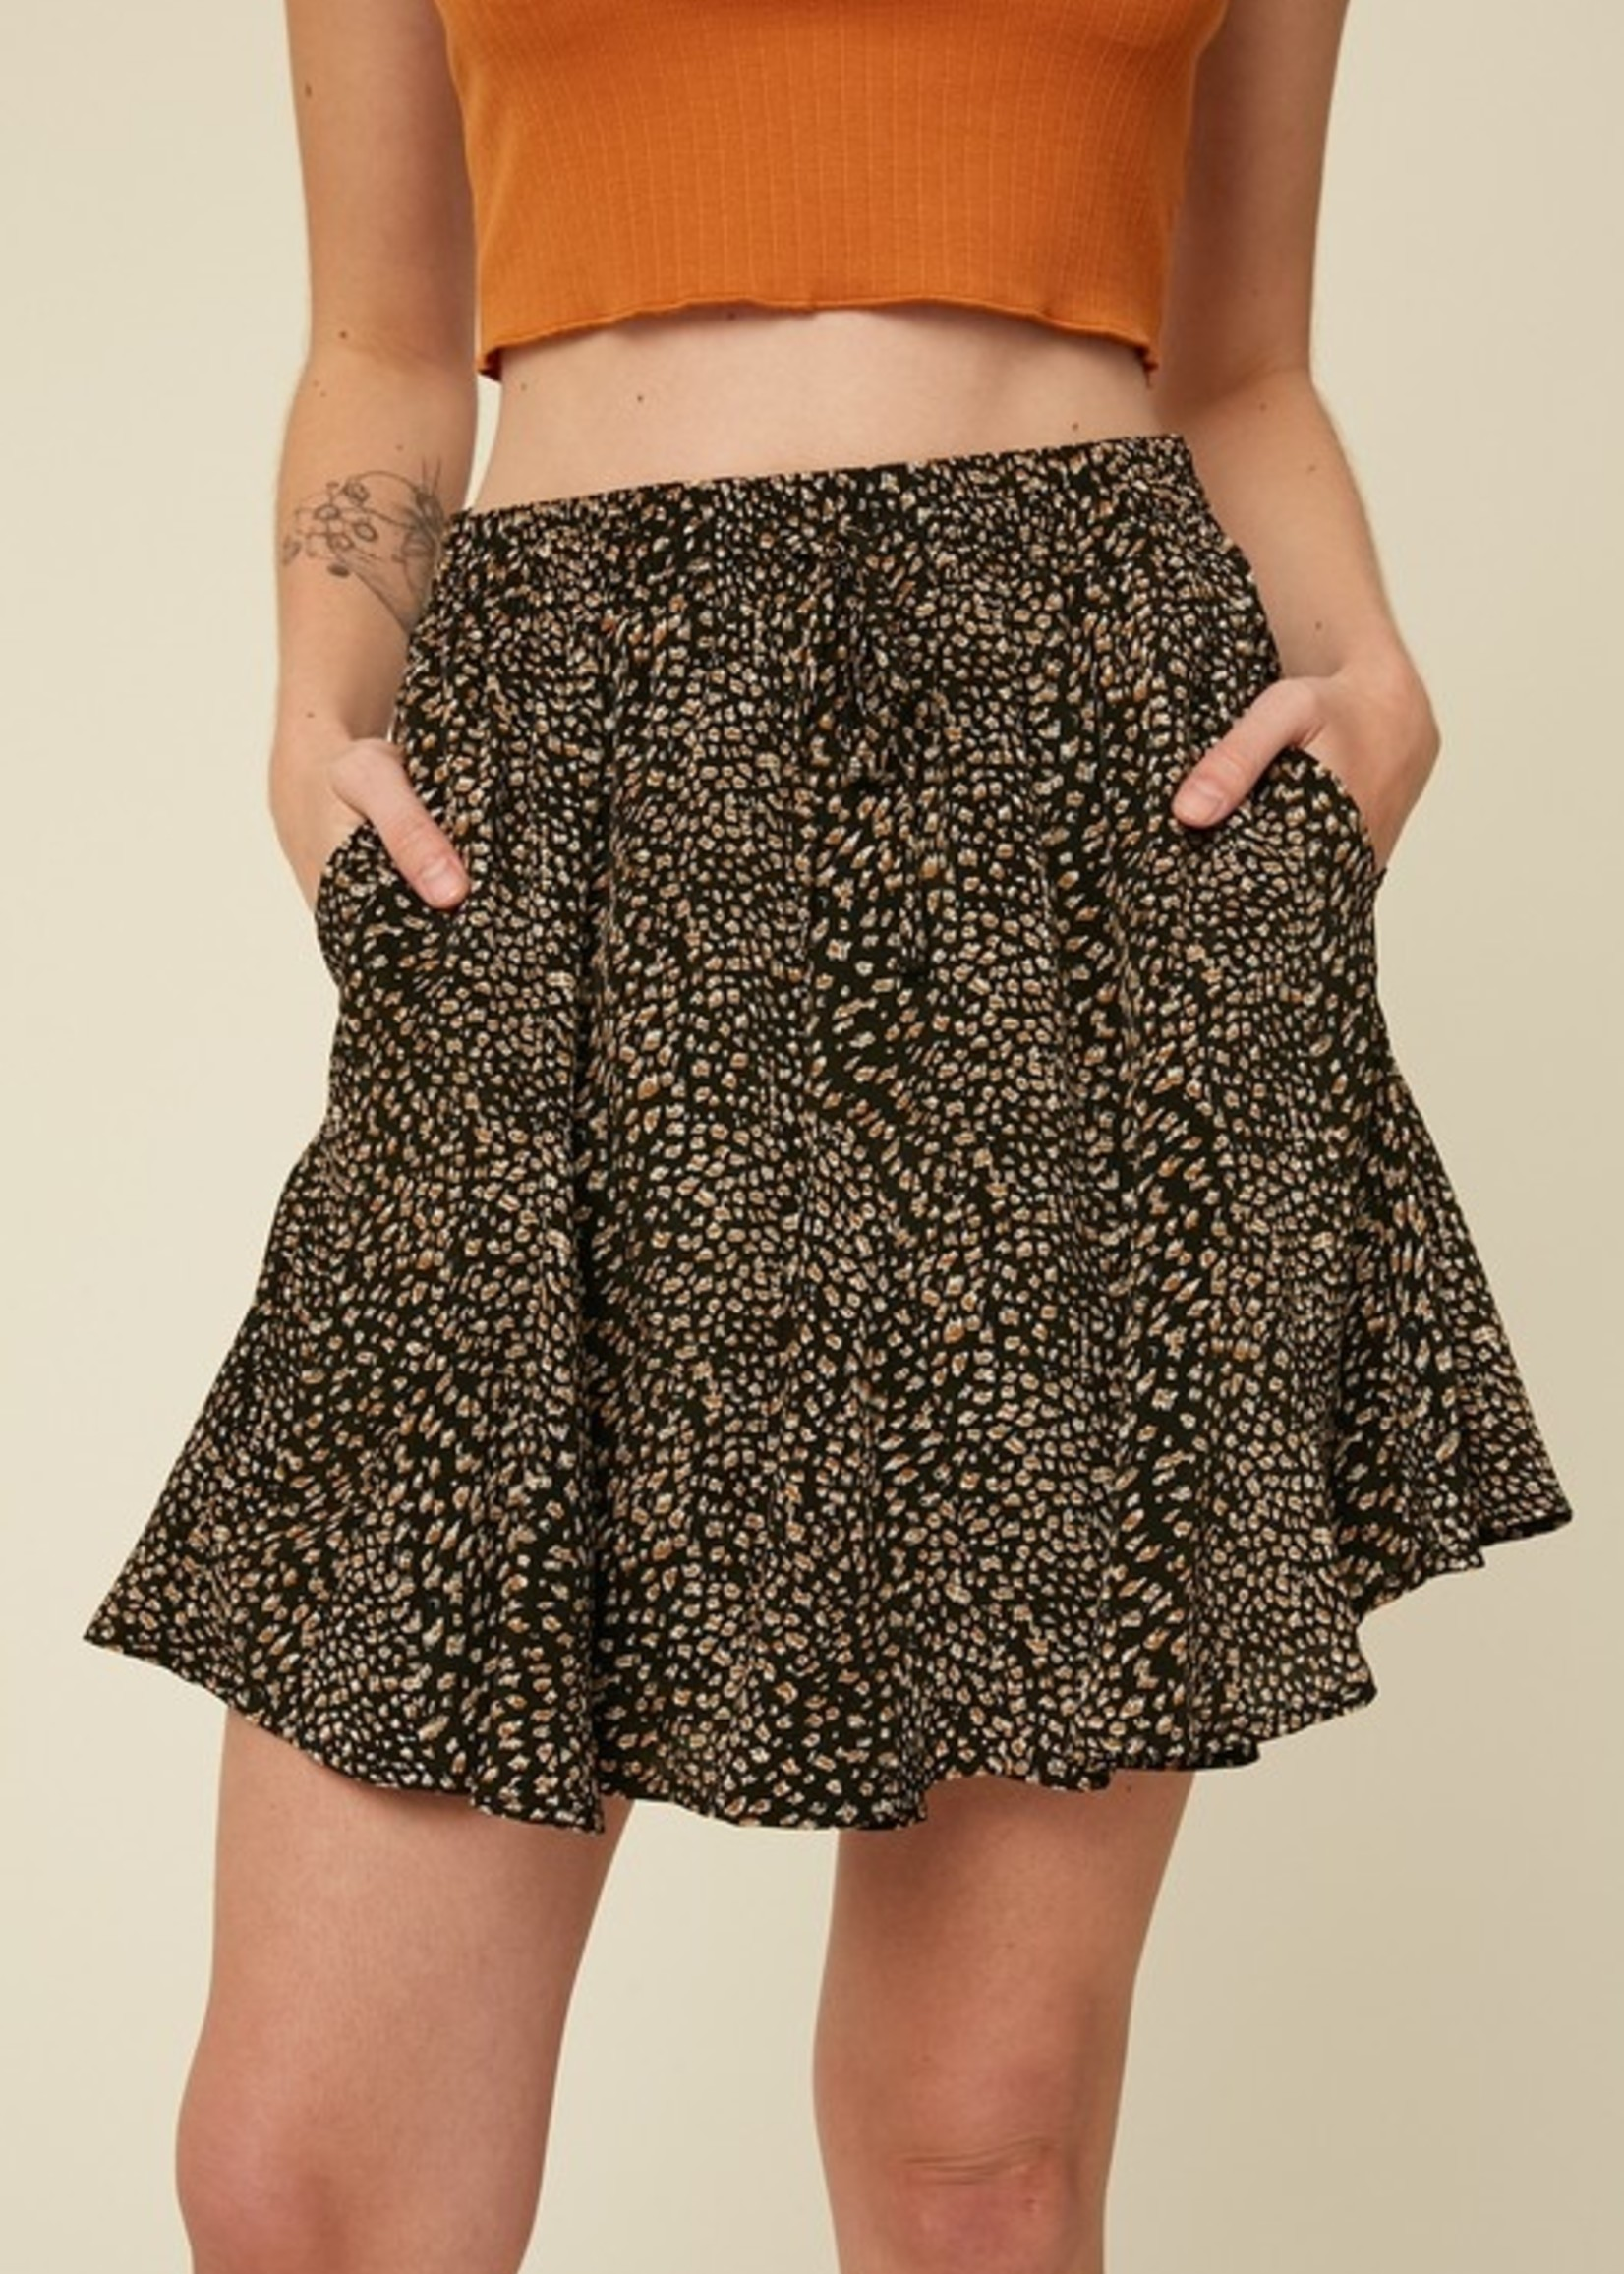 Leopard Print Skirt -Black